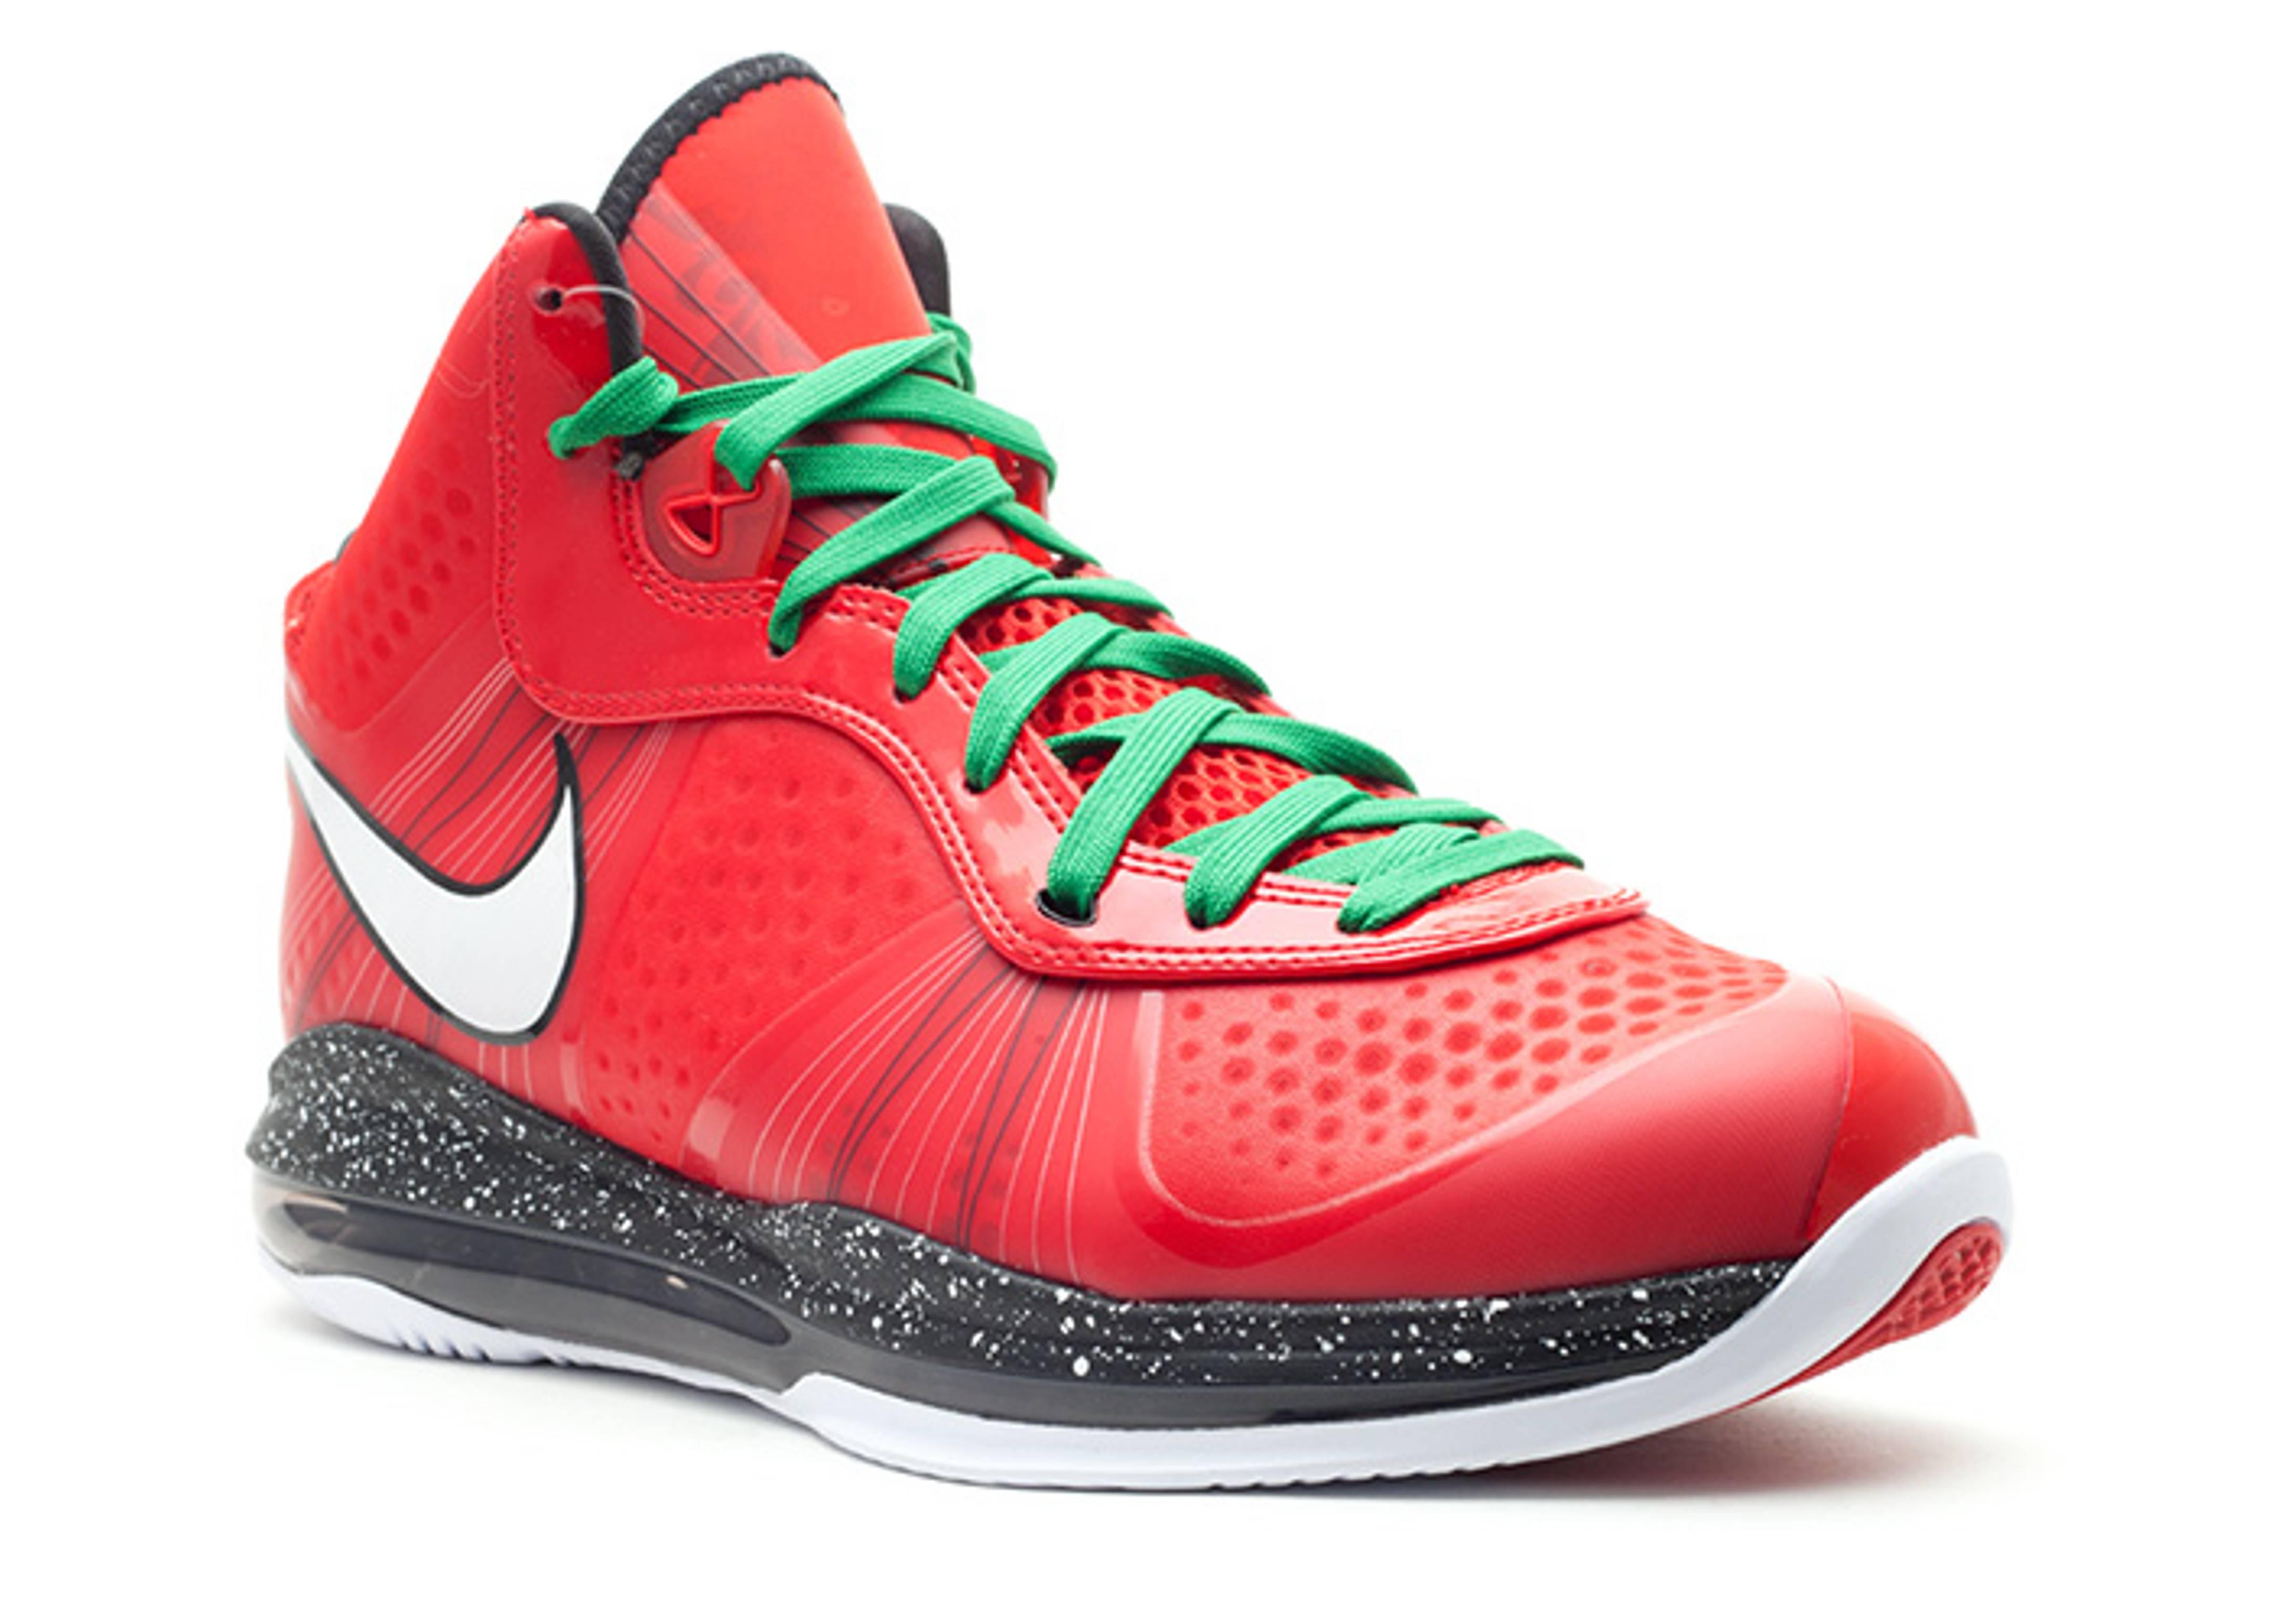 wholesale dealer 71f5b 620a8 lebron 10 christmas red shoe